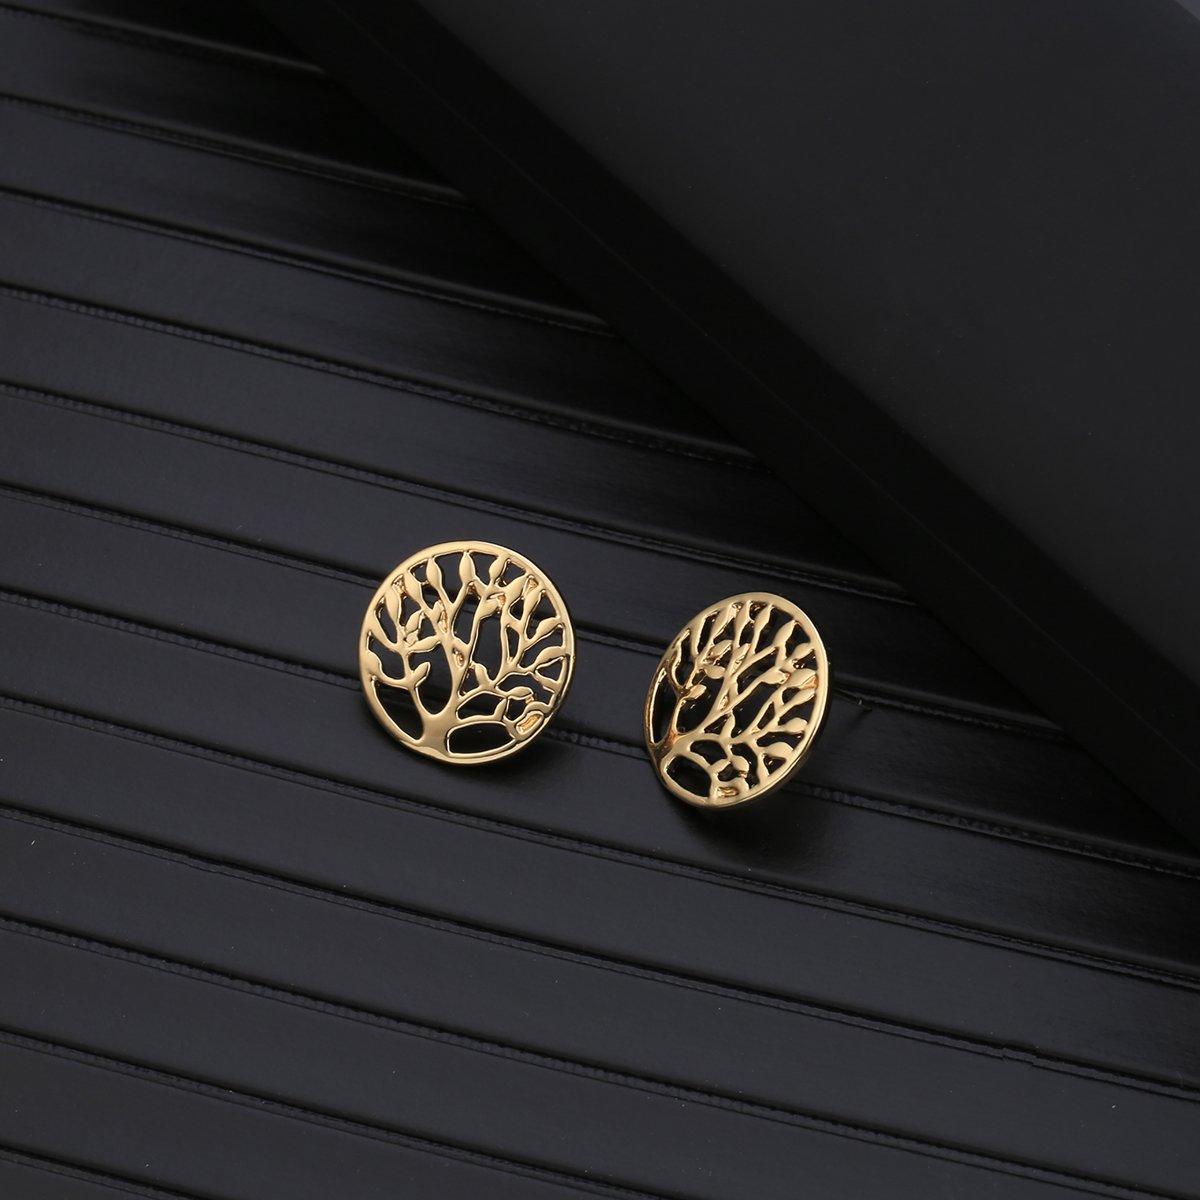 Stud Earring for Women,Tree of Life Earring Stud Girl Silver Dangle Earring Small Stainless Steel Earring